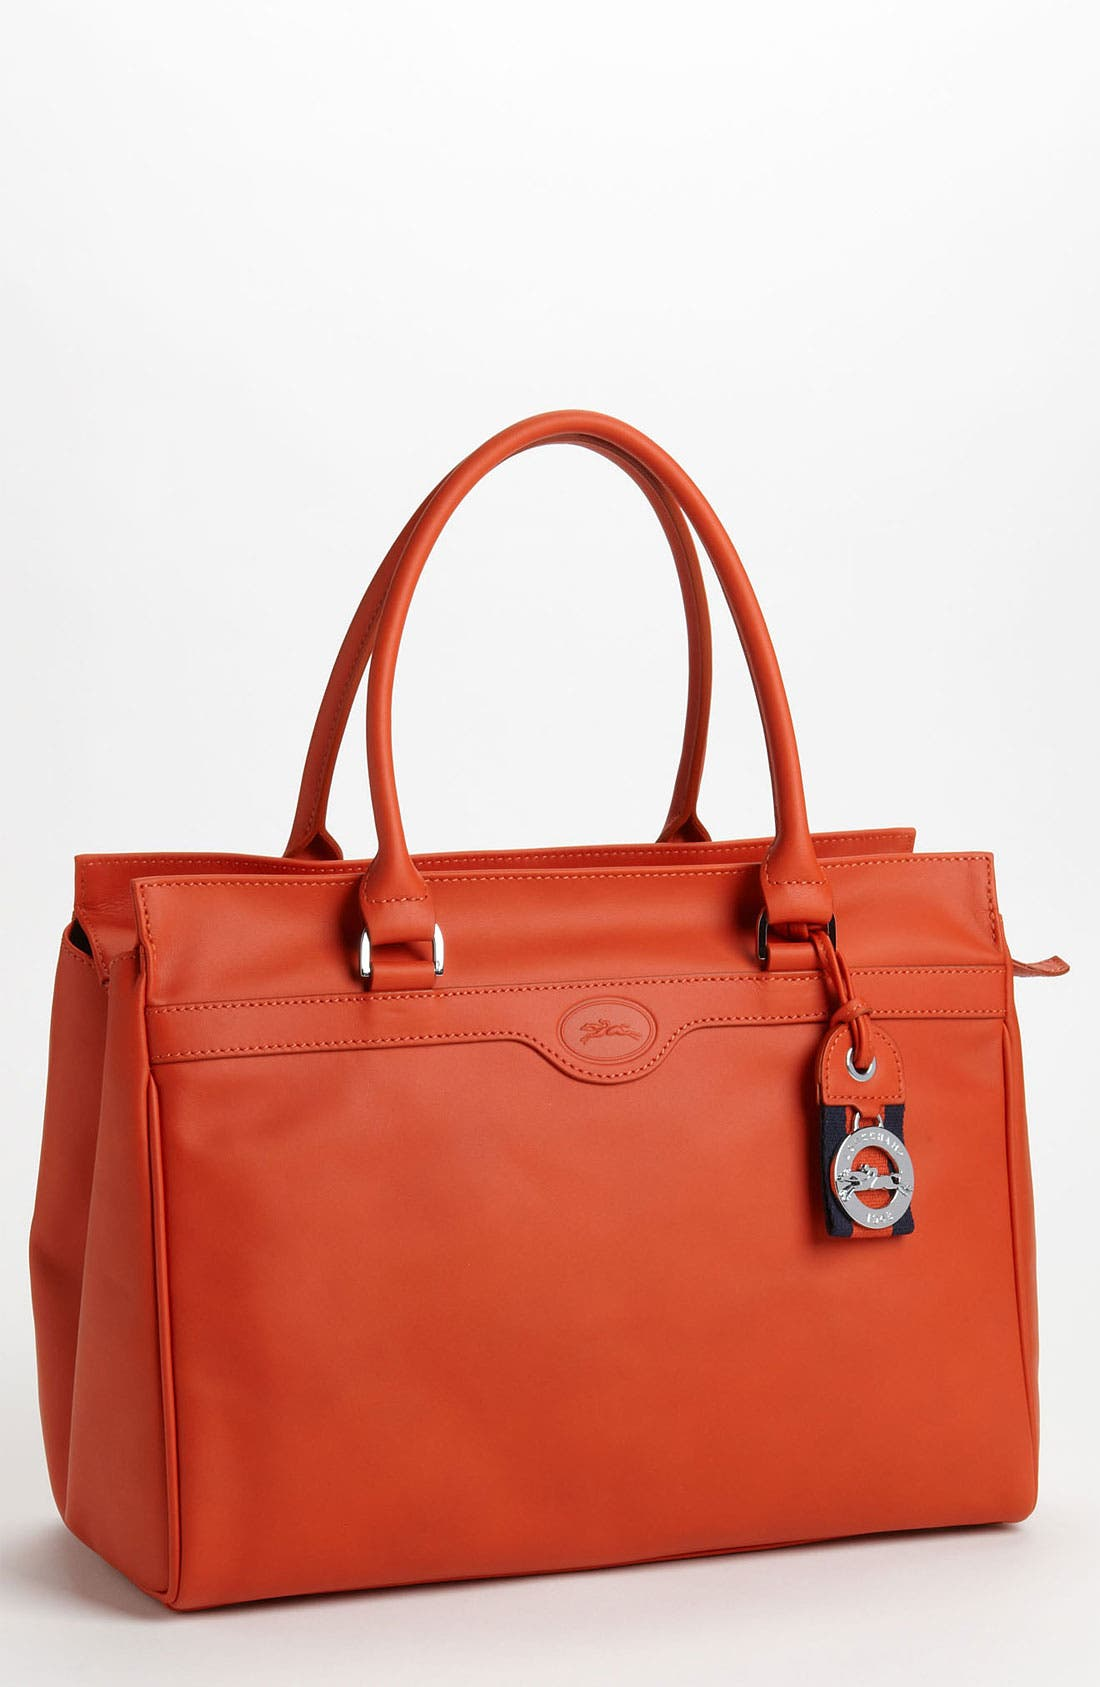 Main Image - Longchamp 'Au Sultan' Shoulder Bag